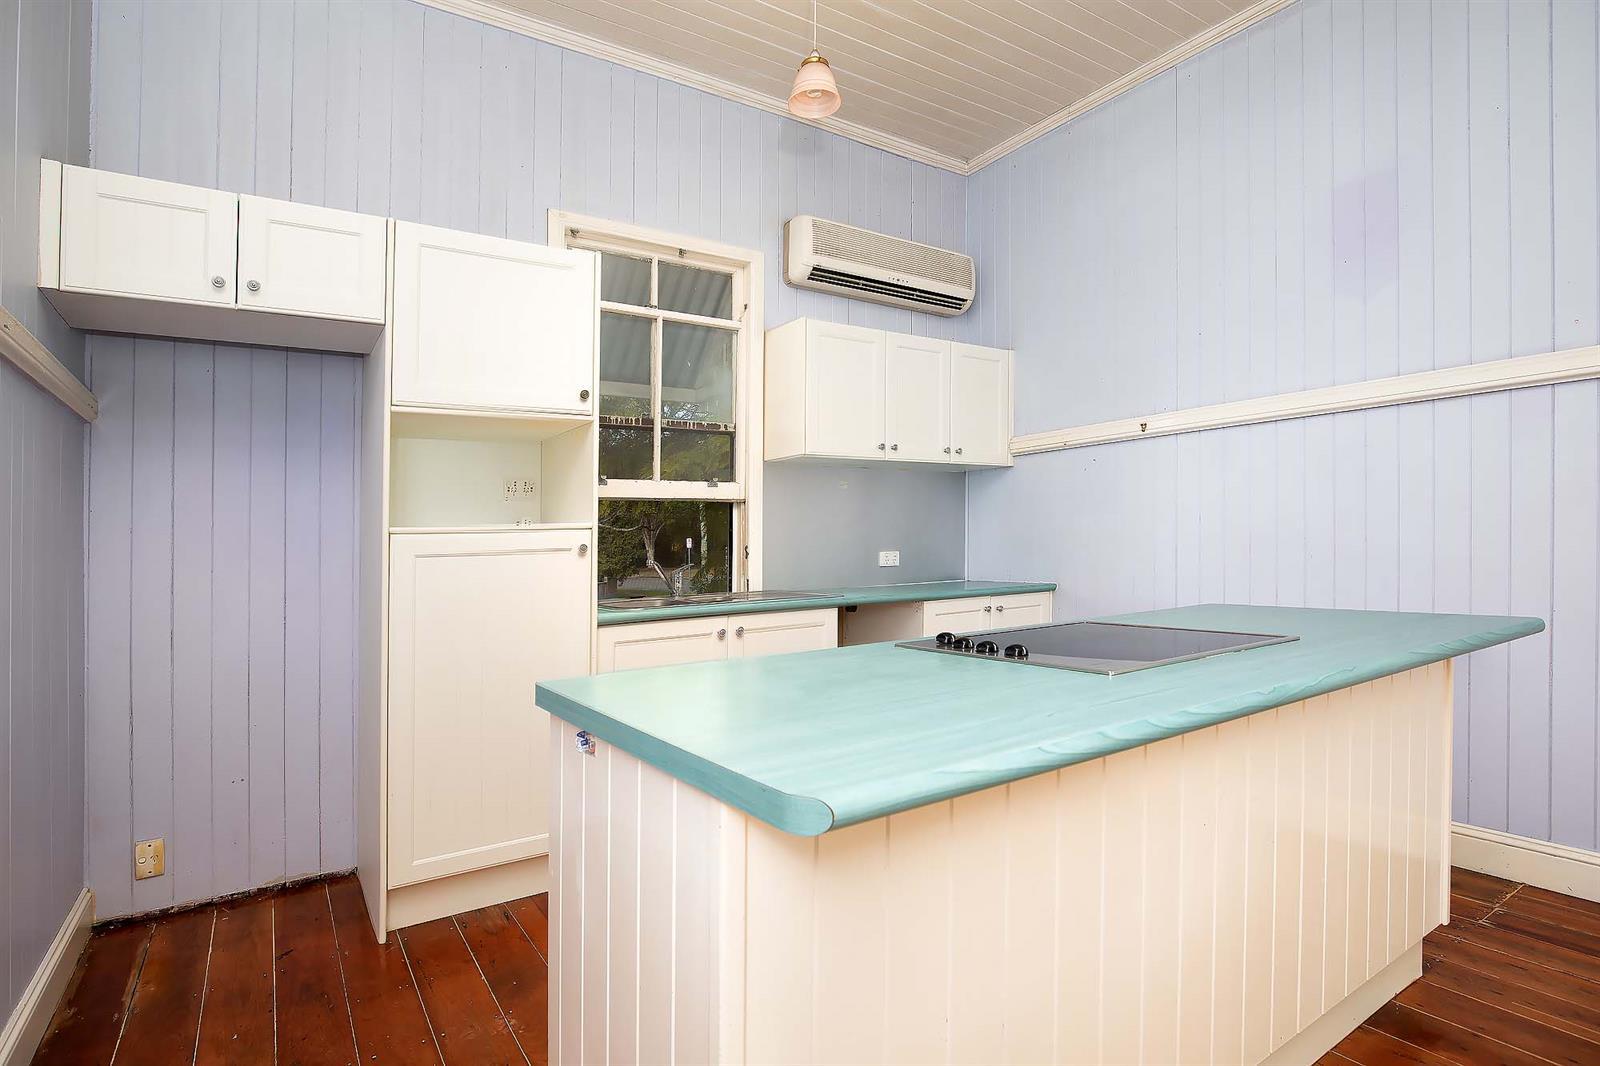 247 Douglas Rd SALISBURY QLD 4107 Image 2